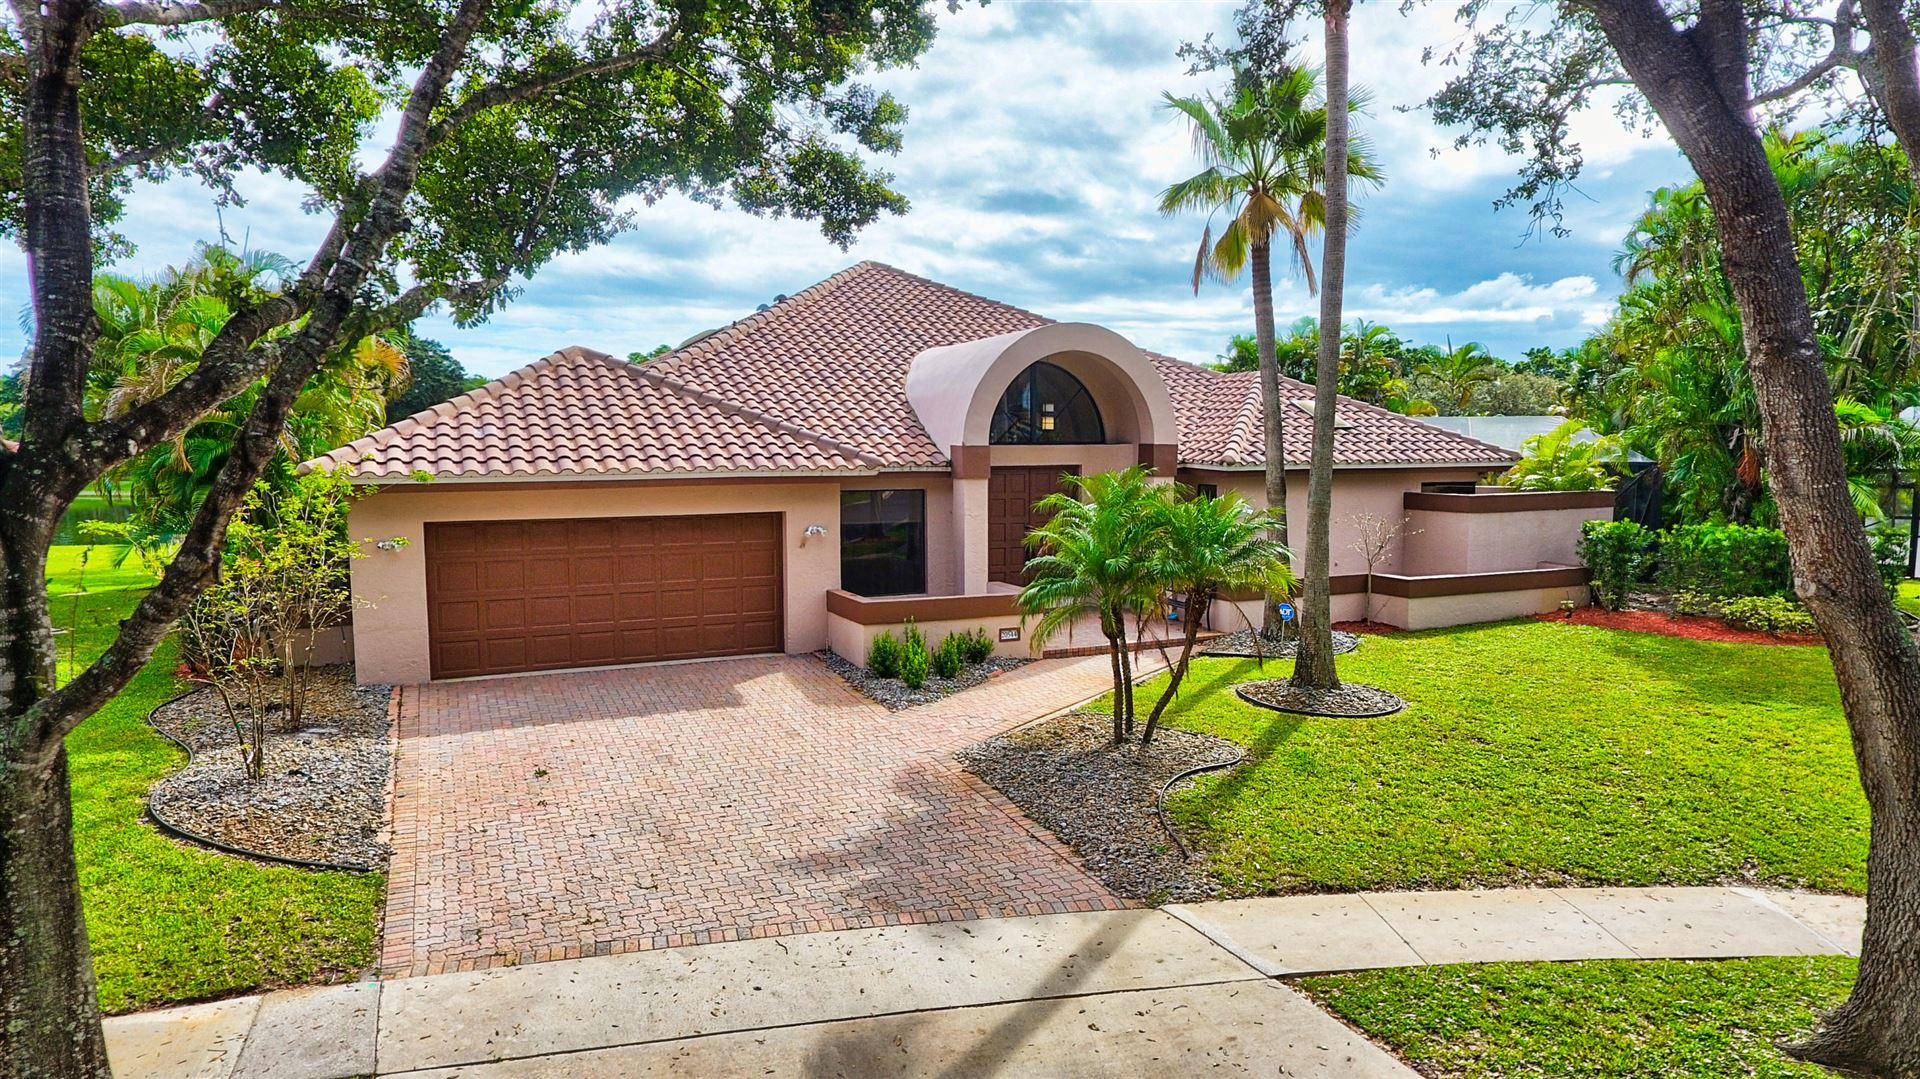 Photo of 20544 Sausalito Drive, Boca Raton, FL 33498 (MLS # RX-10674600)